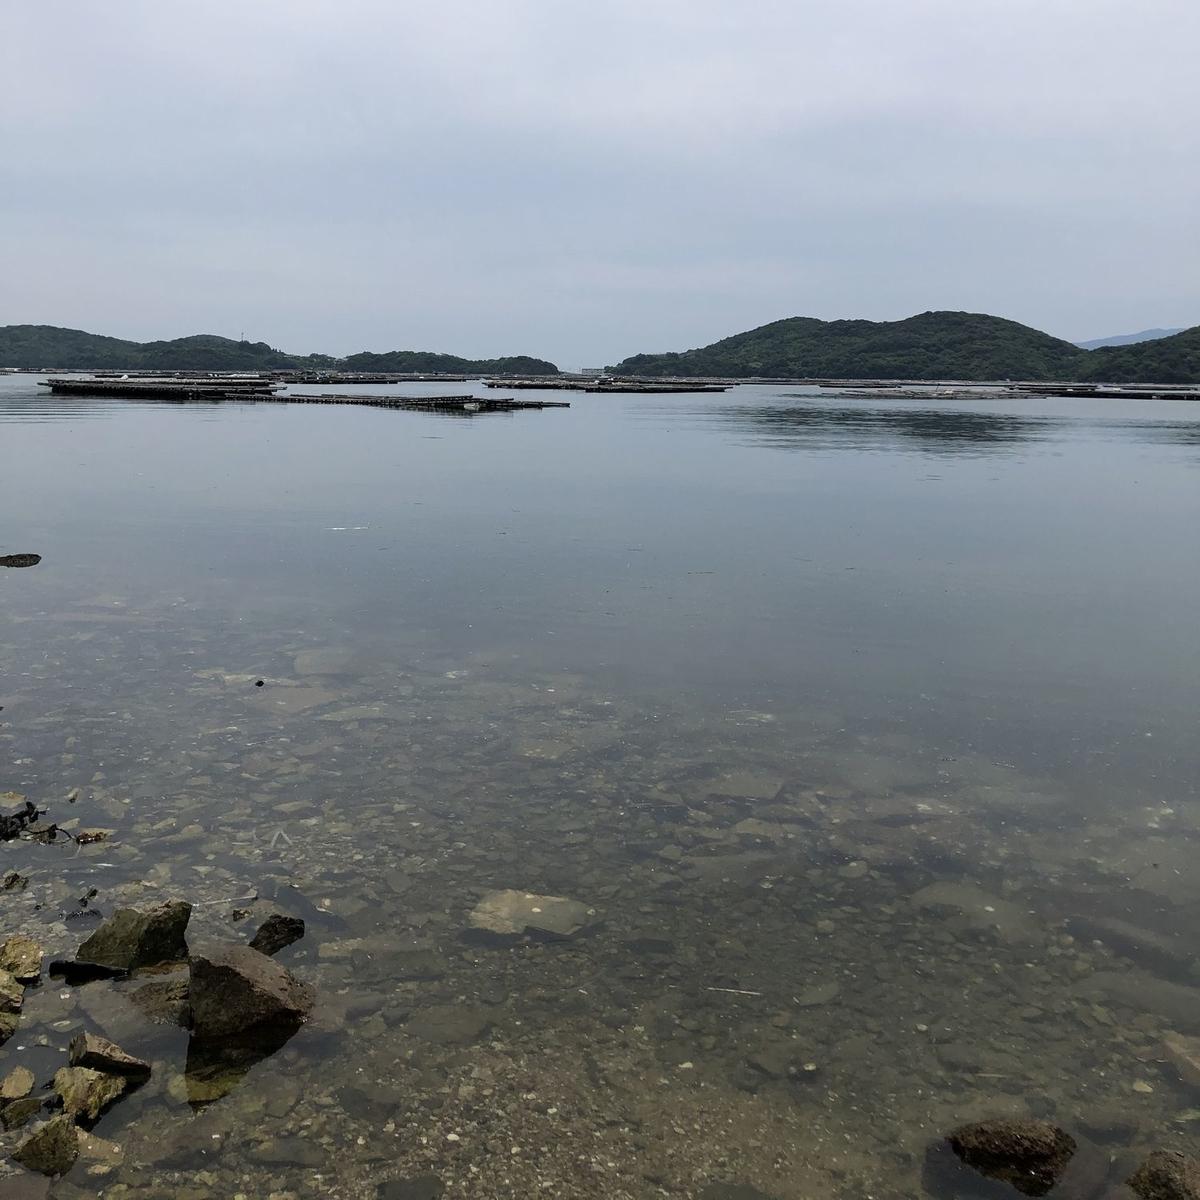 f:id:shiratsume:20200625183428j:plain